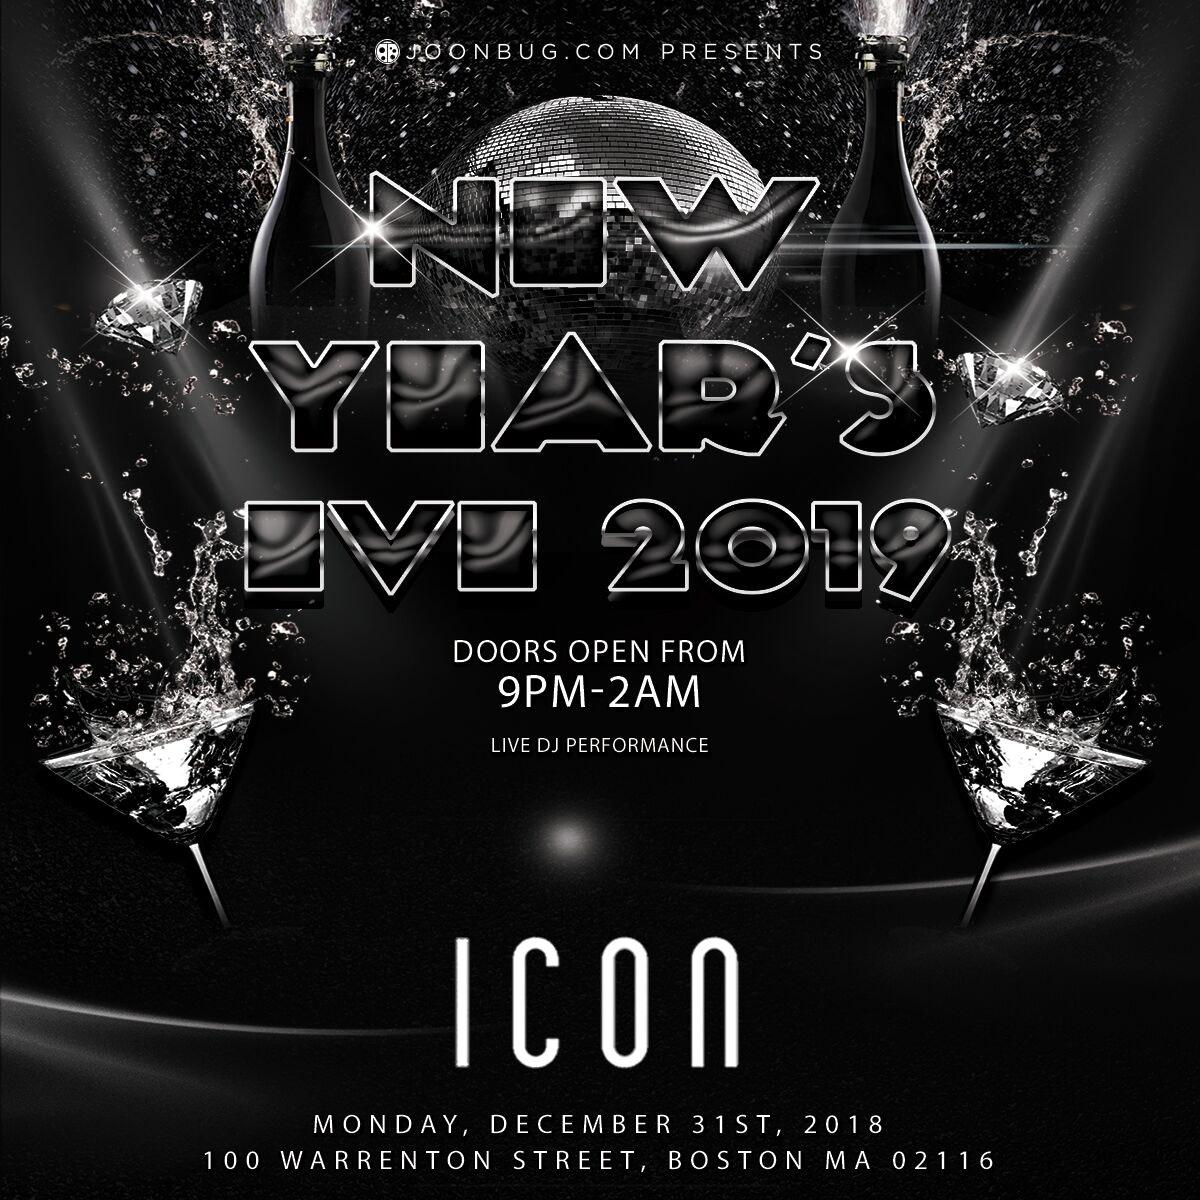 ICON Nightclub New Years Flyer